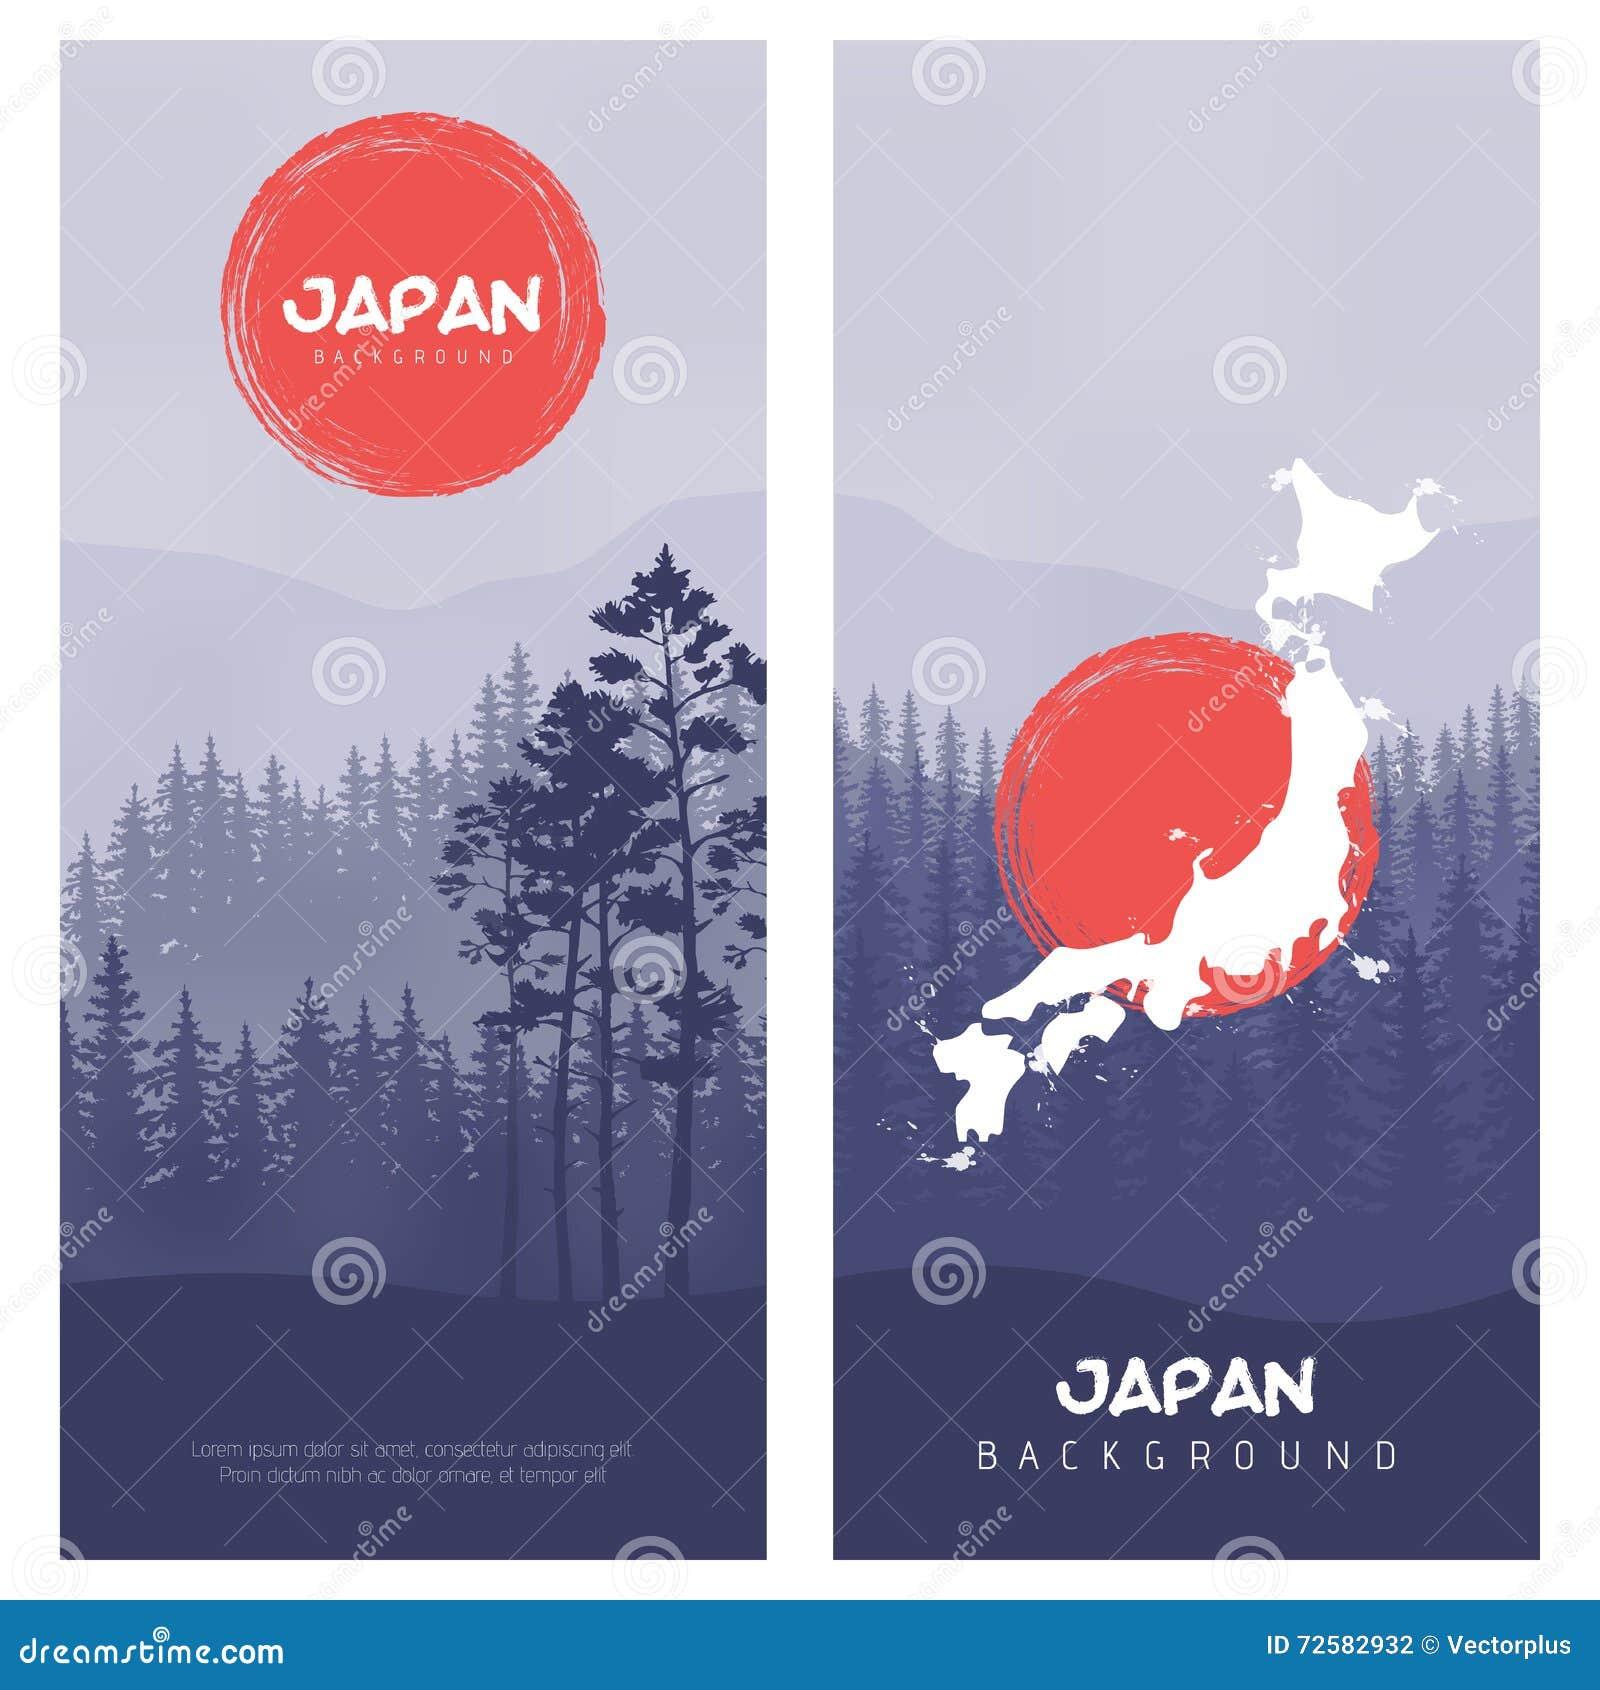 mountain and forest landscape illustration of japan flag vector